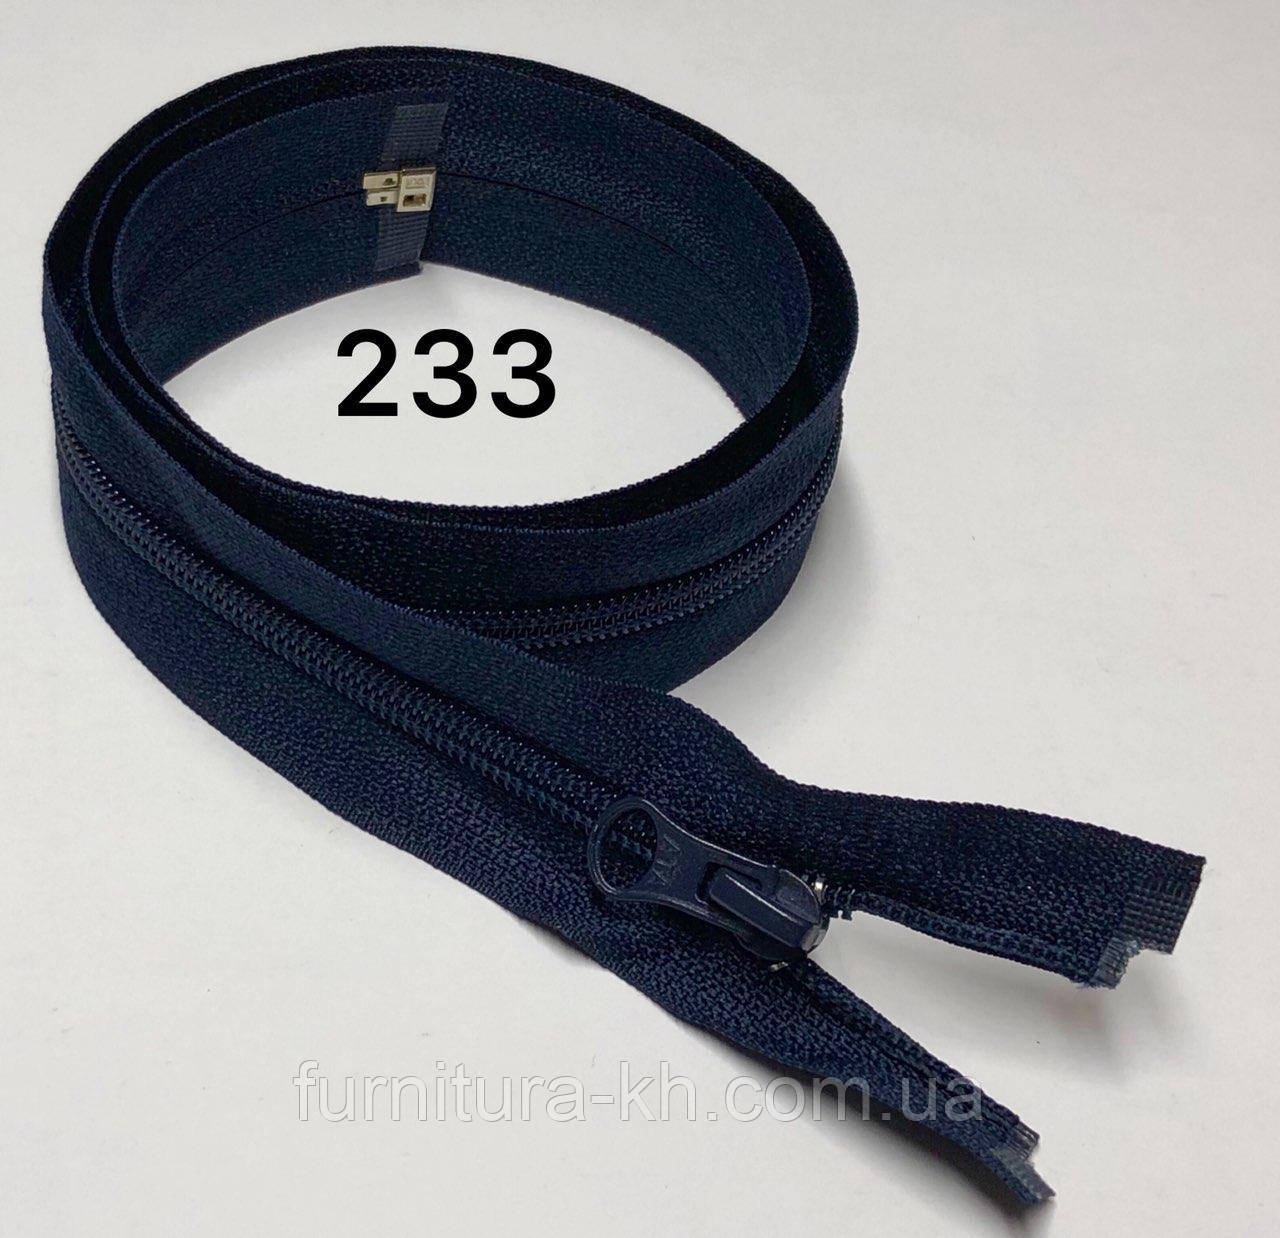 Спираль Тип 5-Длинна 80 см.Цвет 233